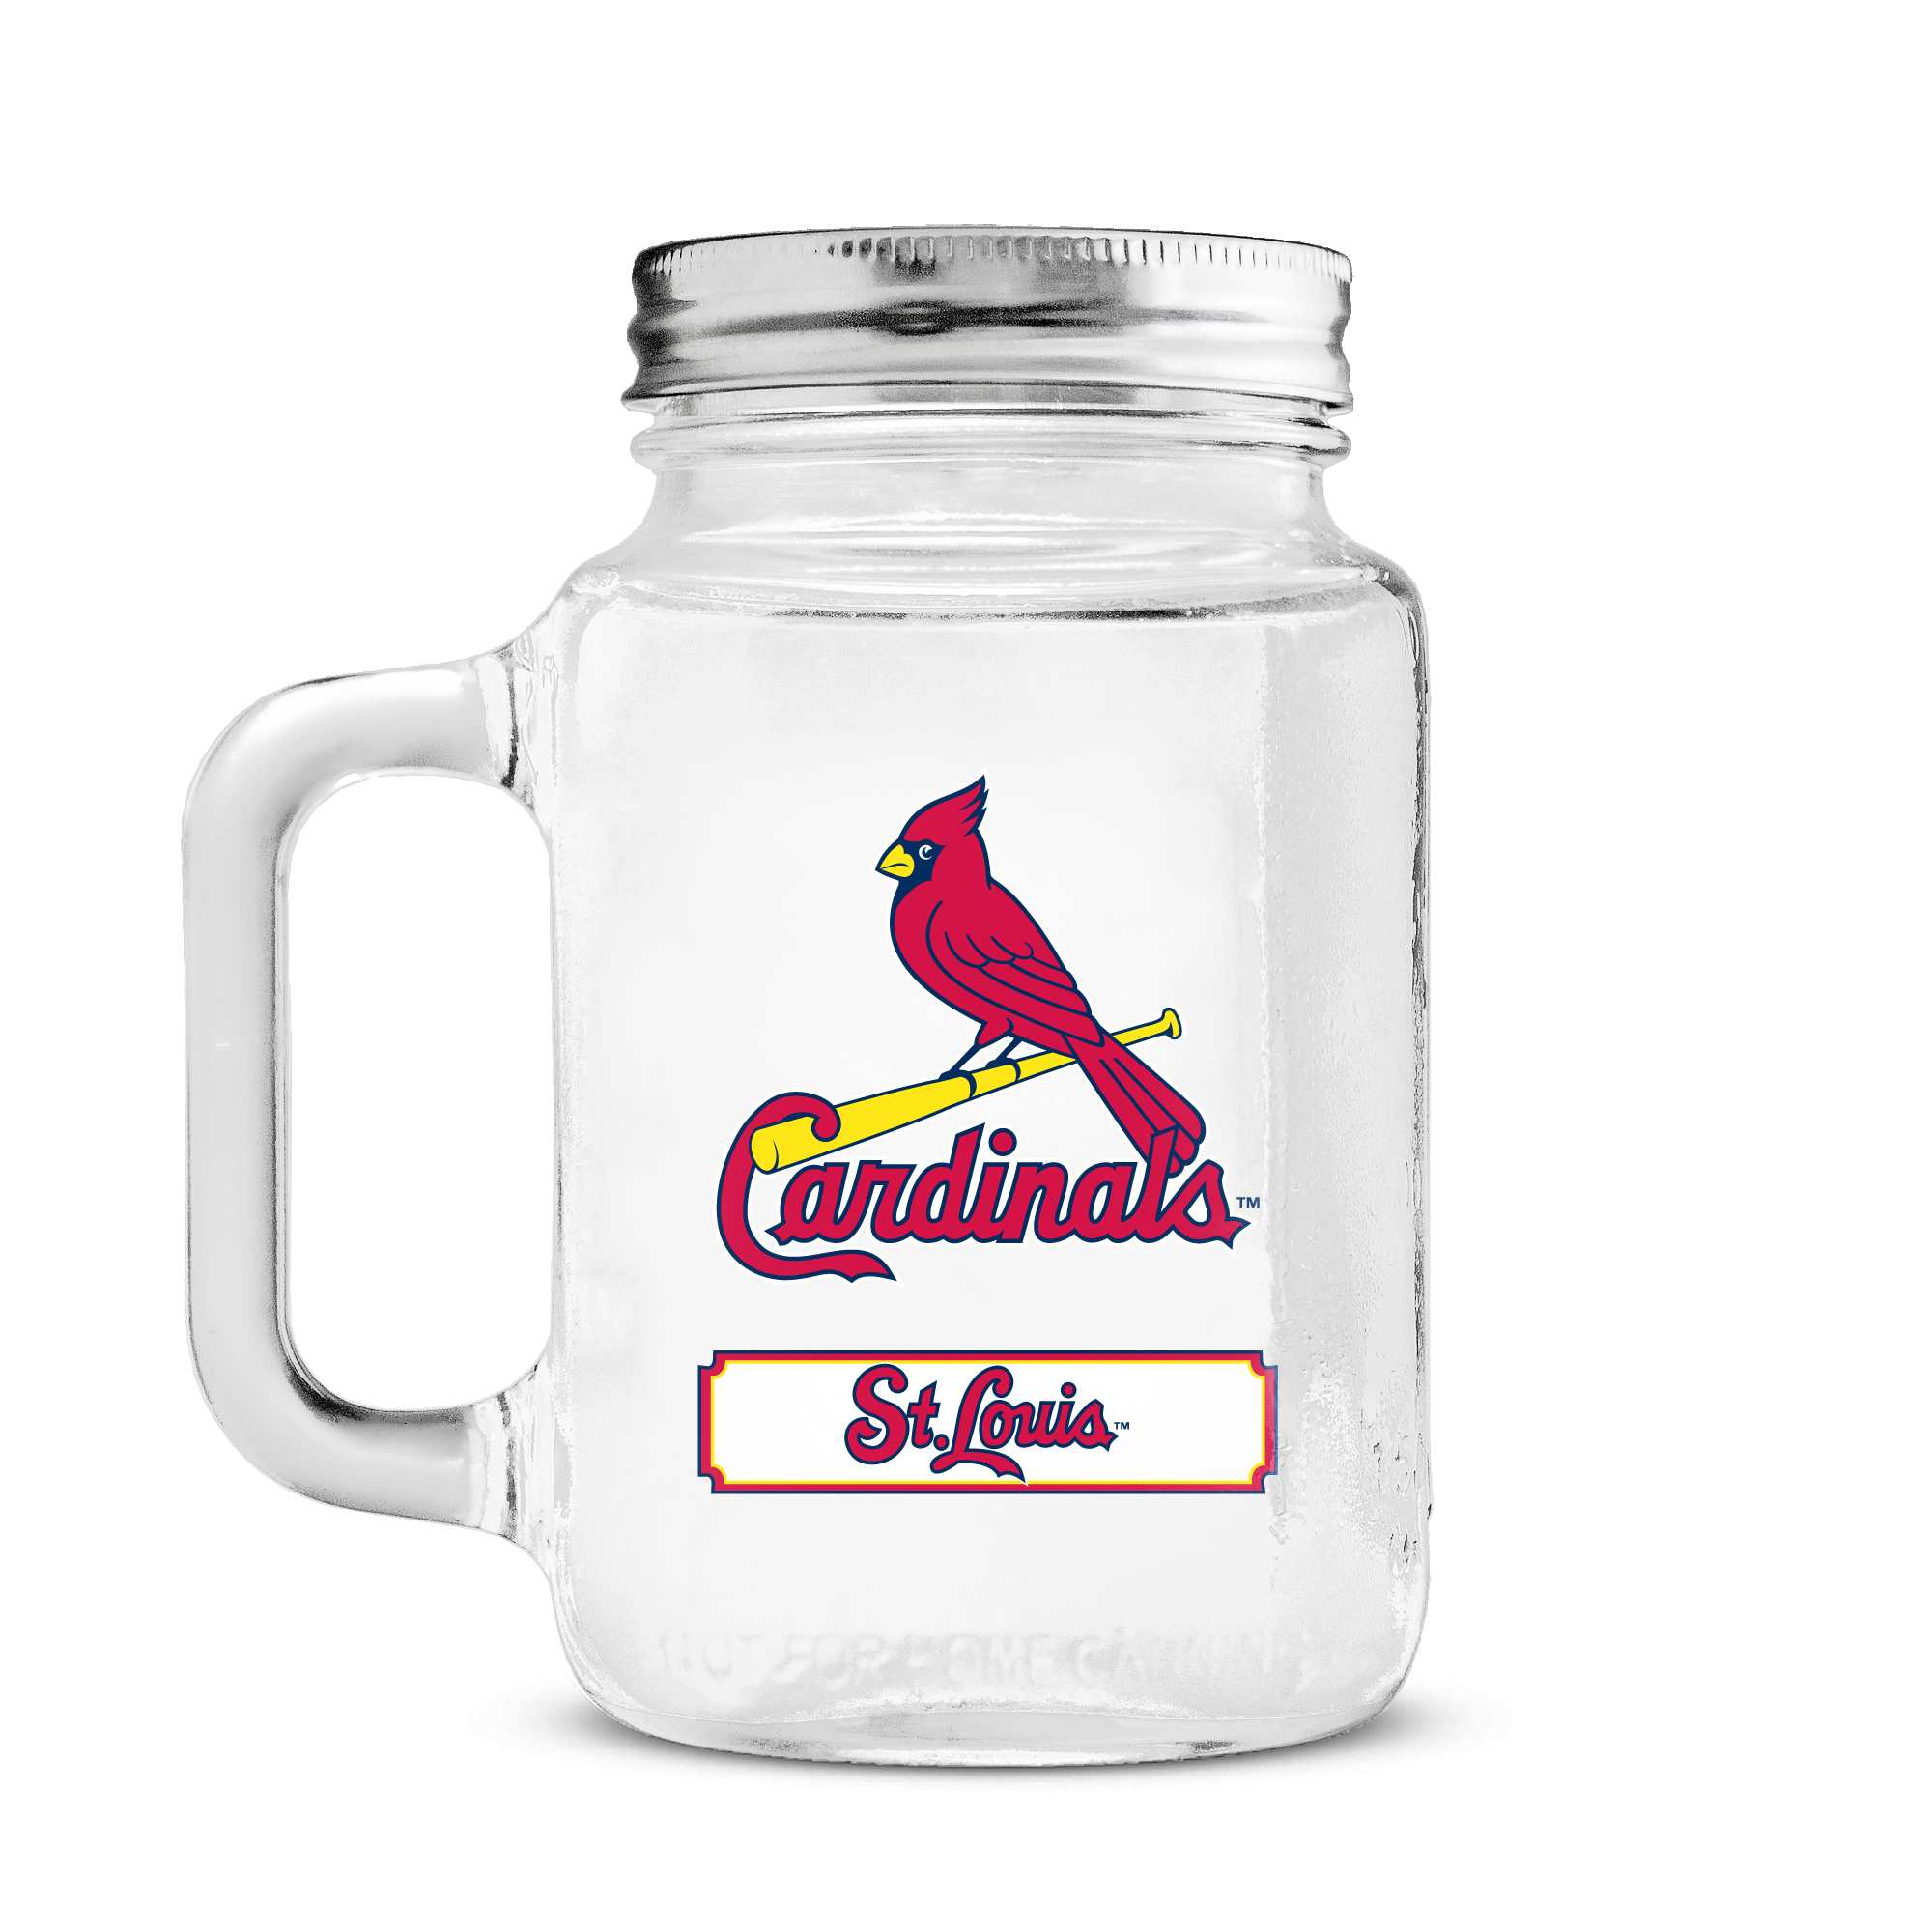 Duckhouse 16 Ounce Mason Jar - St. Louis Cardinals